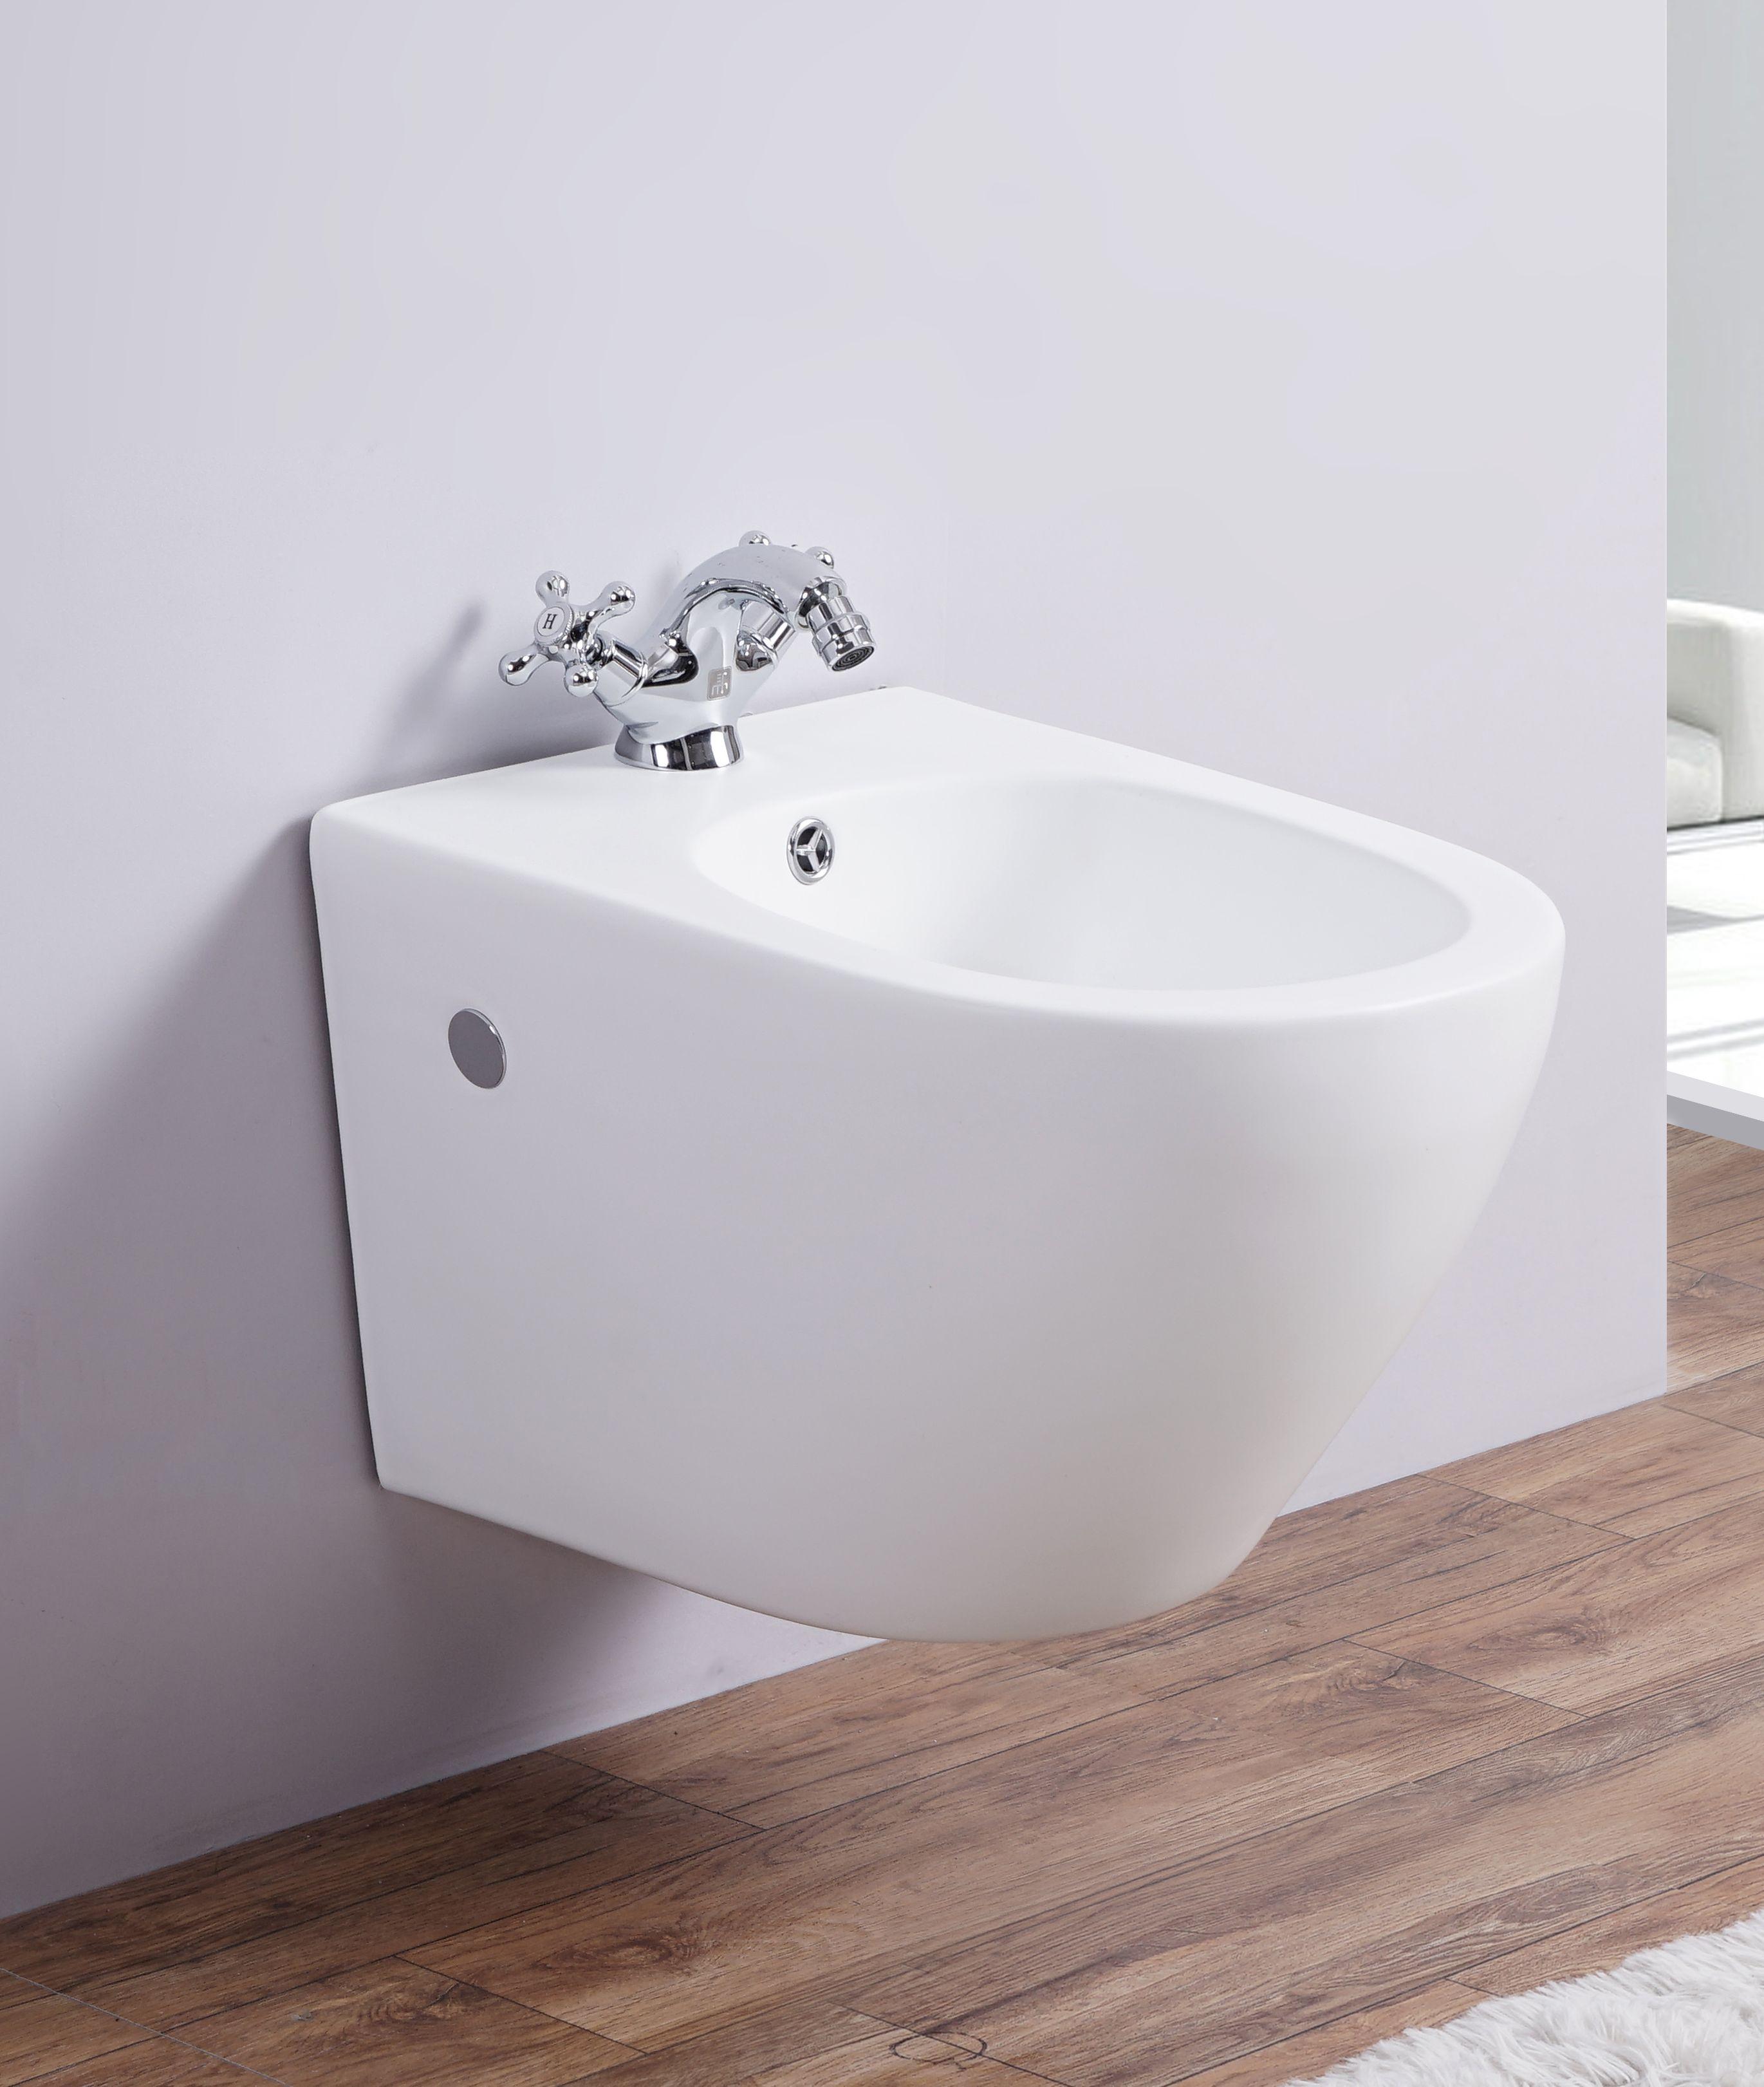 Wand-Bidet WHB-586073 (matt-weiß)